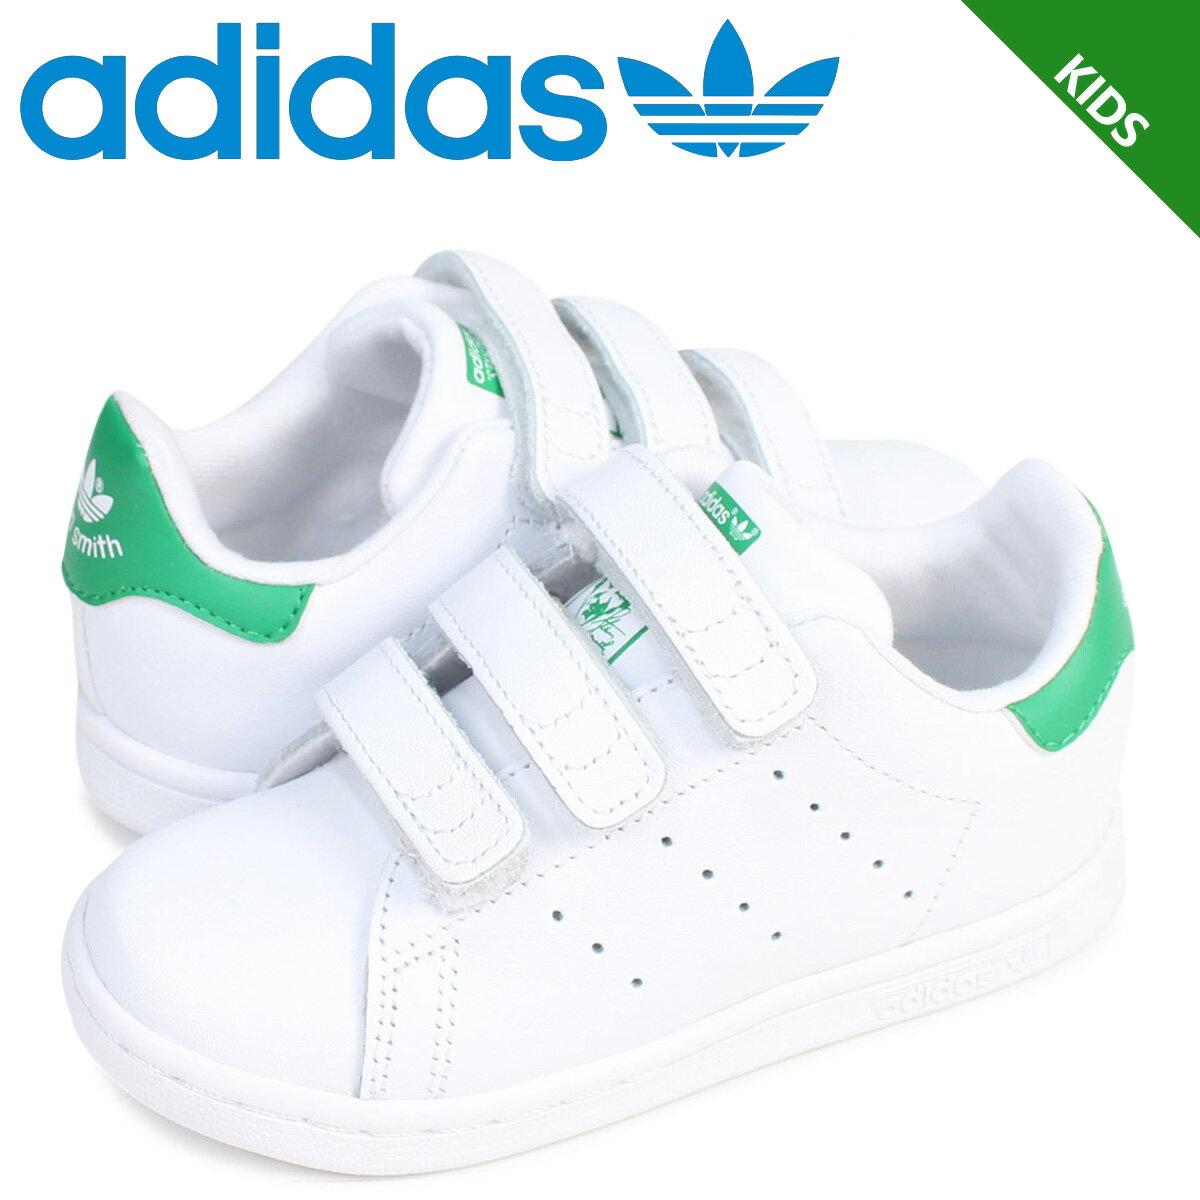 adidas Originals スタンスミス ベルクロ キッズ ベビー アディダス スニーカー STAN SMITH CF I BZ0520 靴 ホワイト グリーン [予約商品 3/2頃入荷予定 追加入荷]